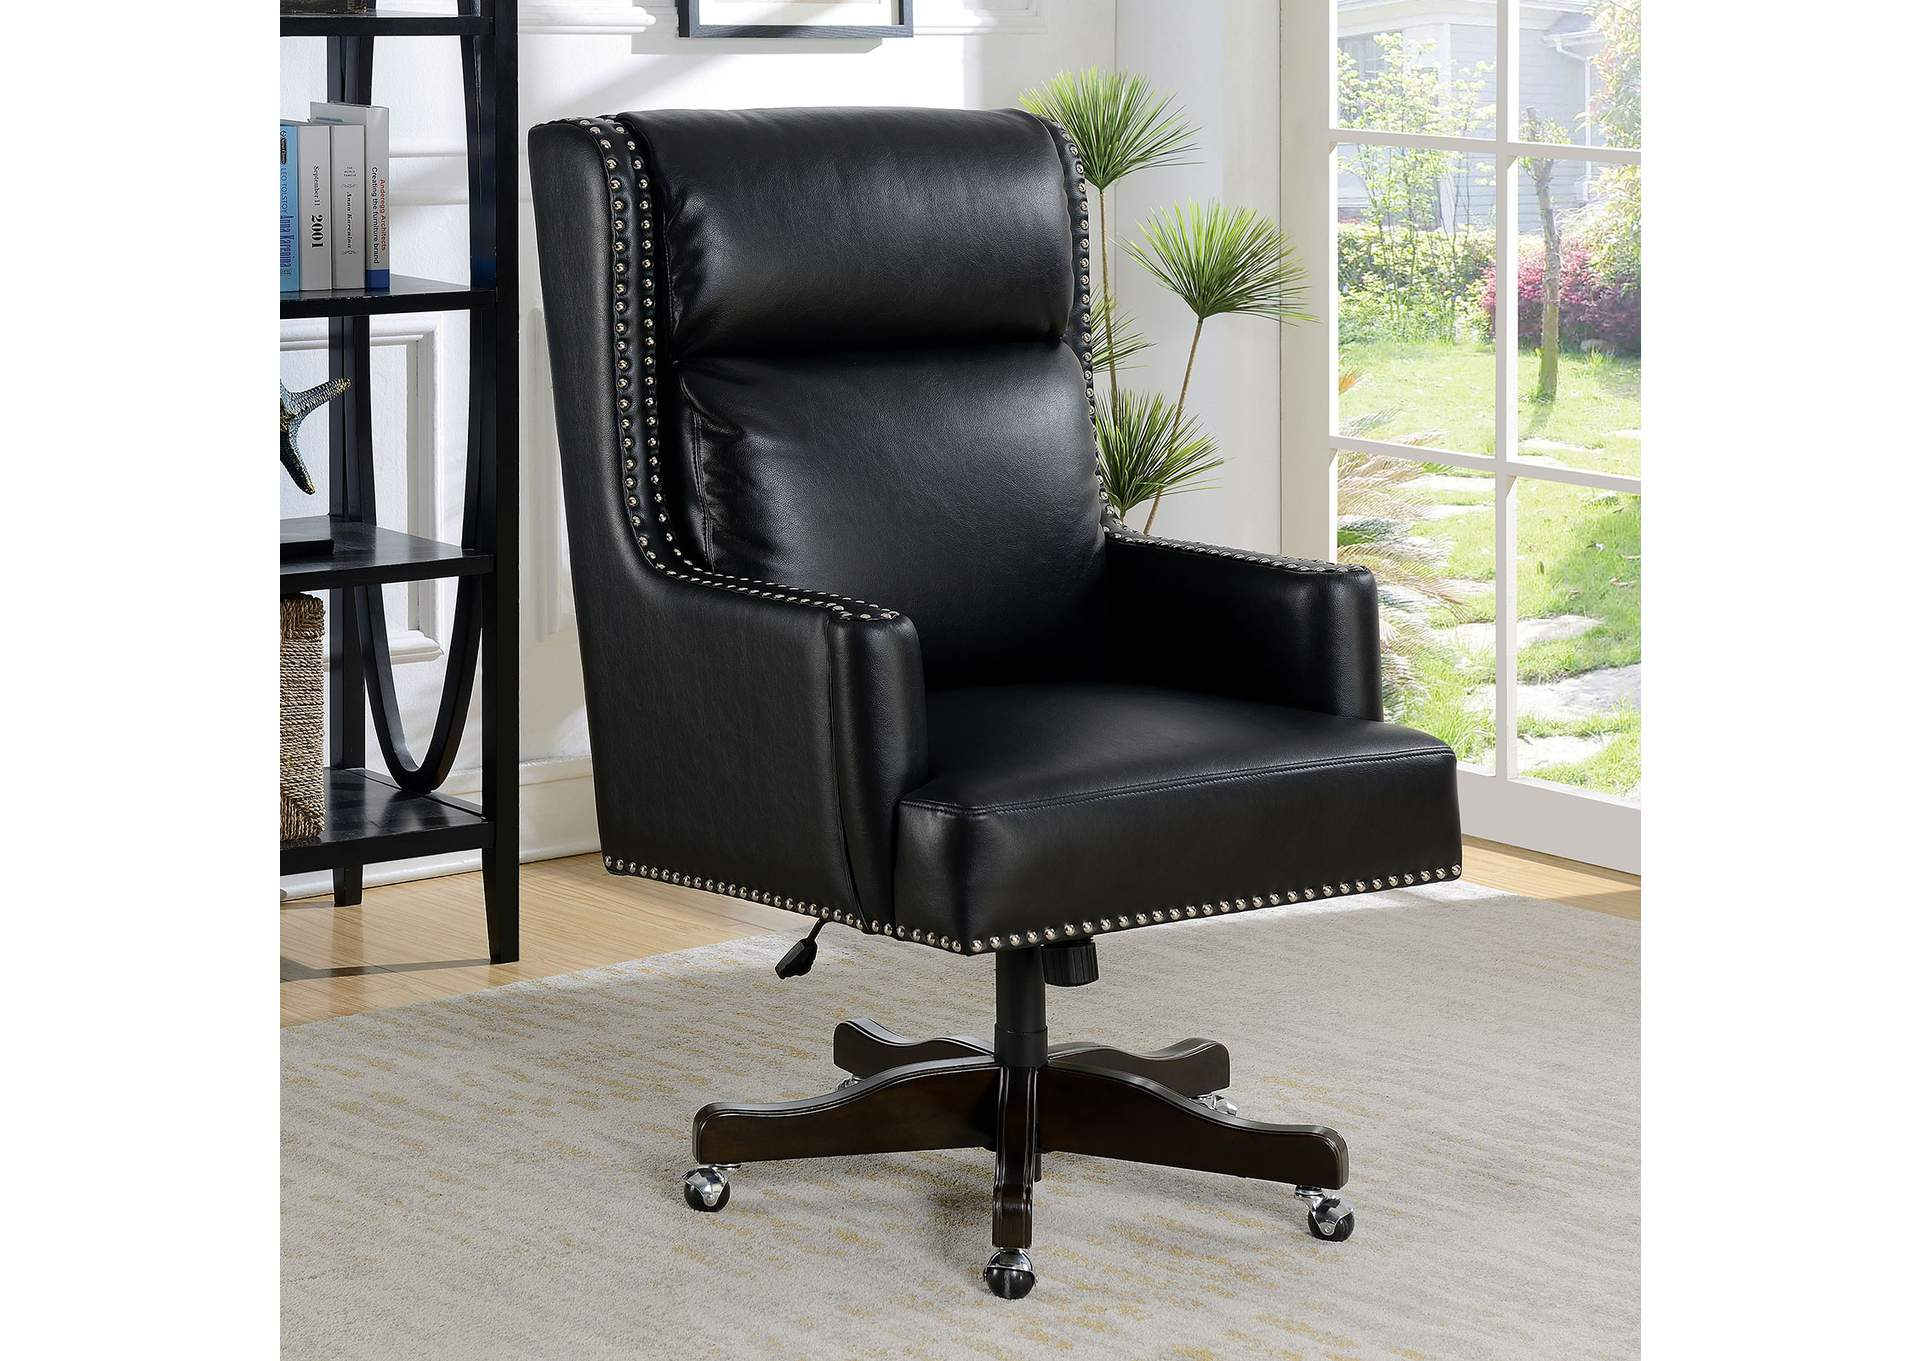 Quality Rugs Home Furnishings Federal Way Wa Bonner Black